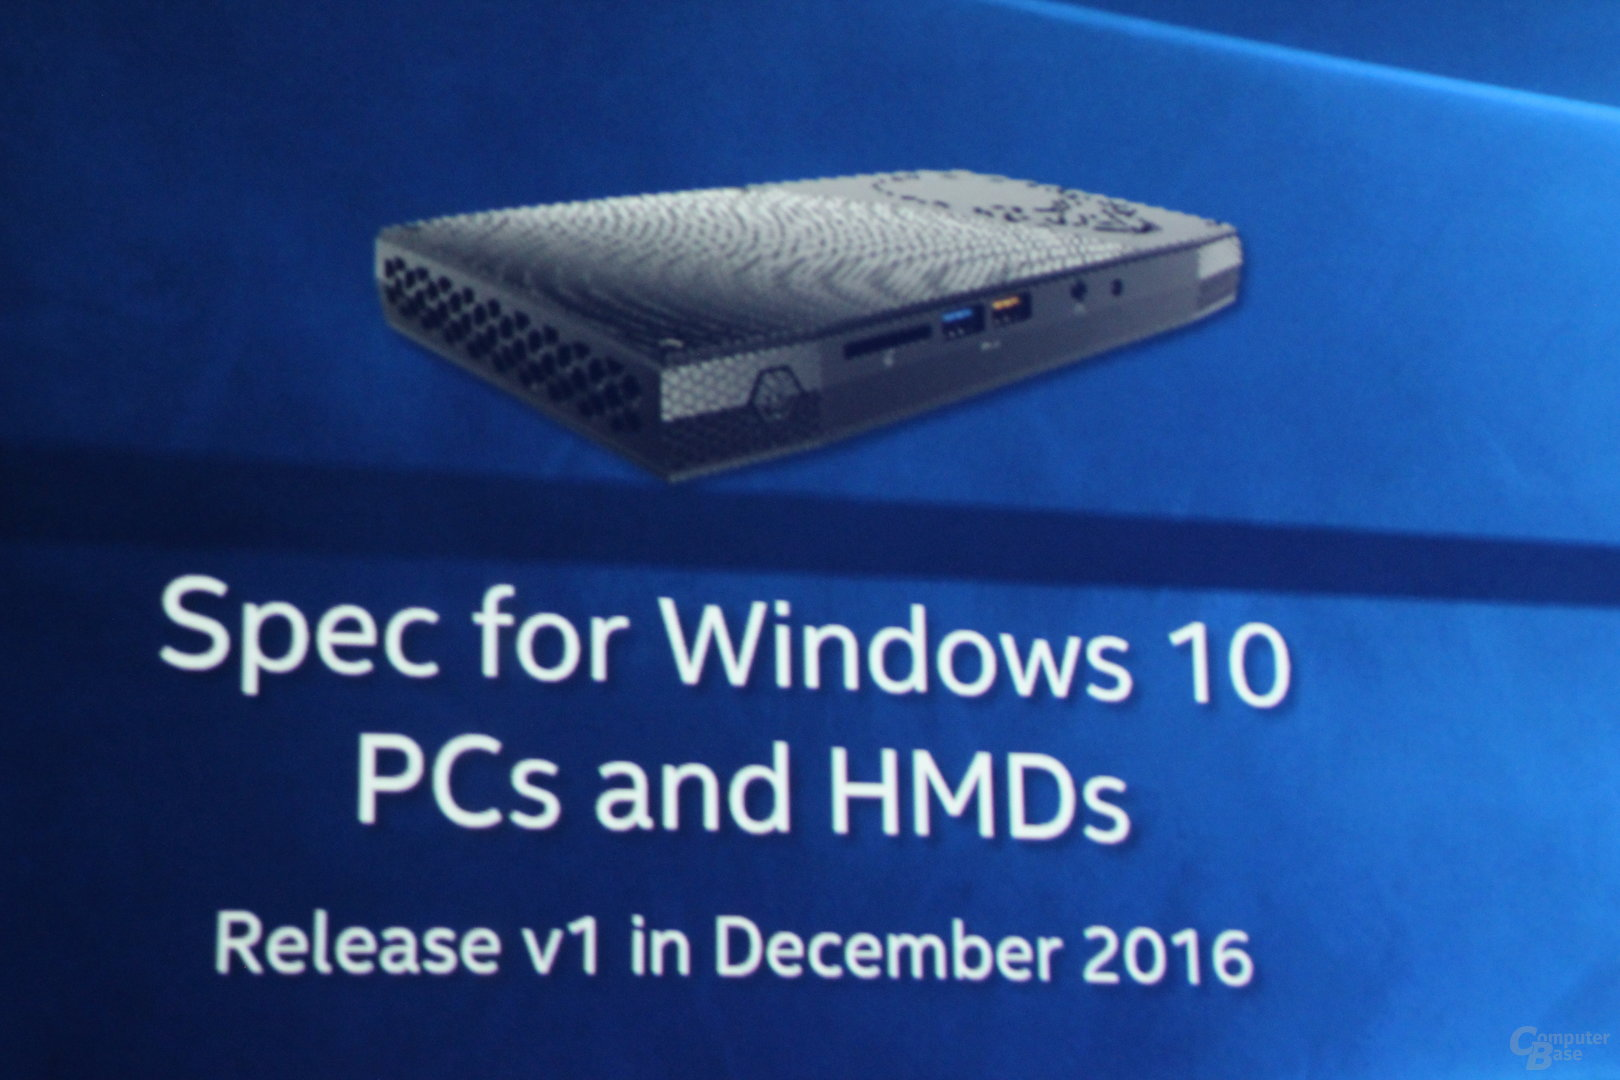 Merged Reality Specs für Windows-PCs ab Ende 2016